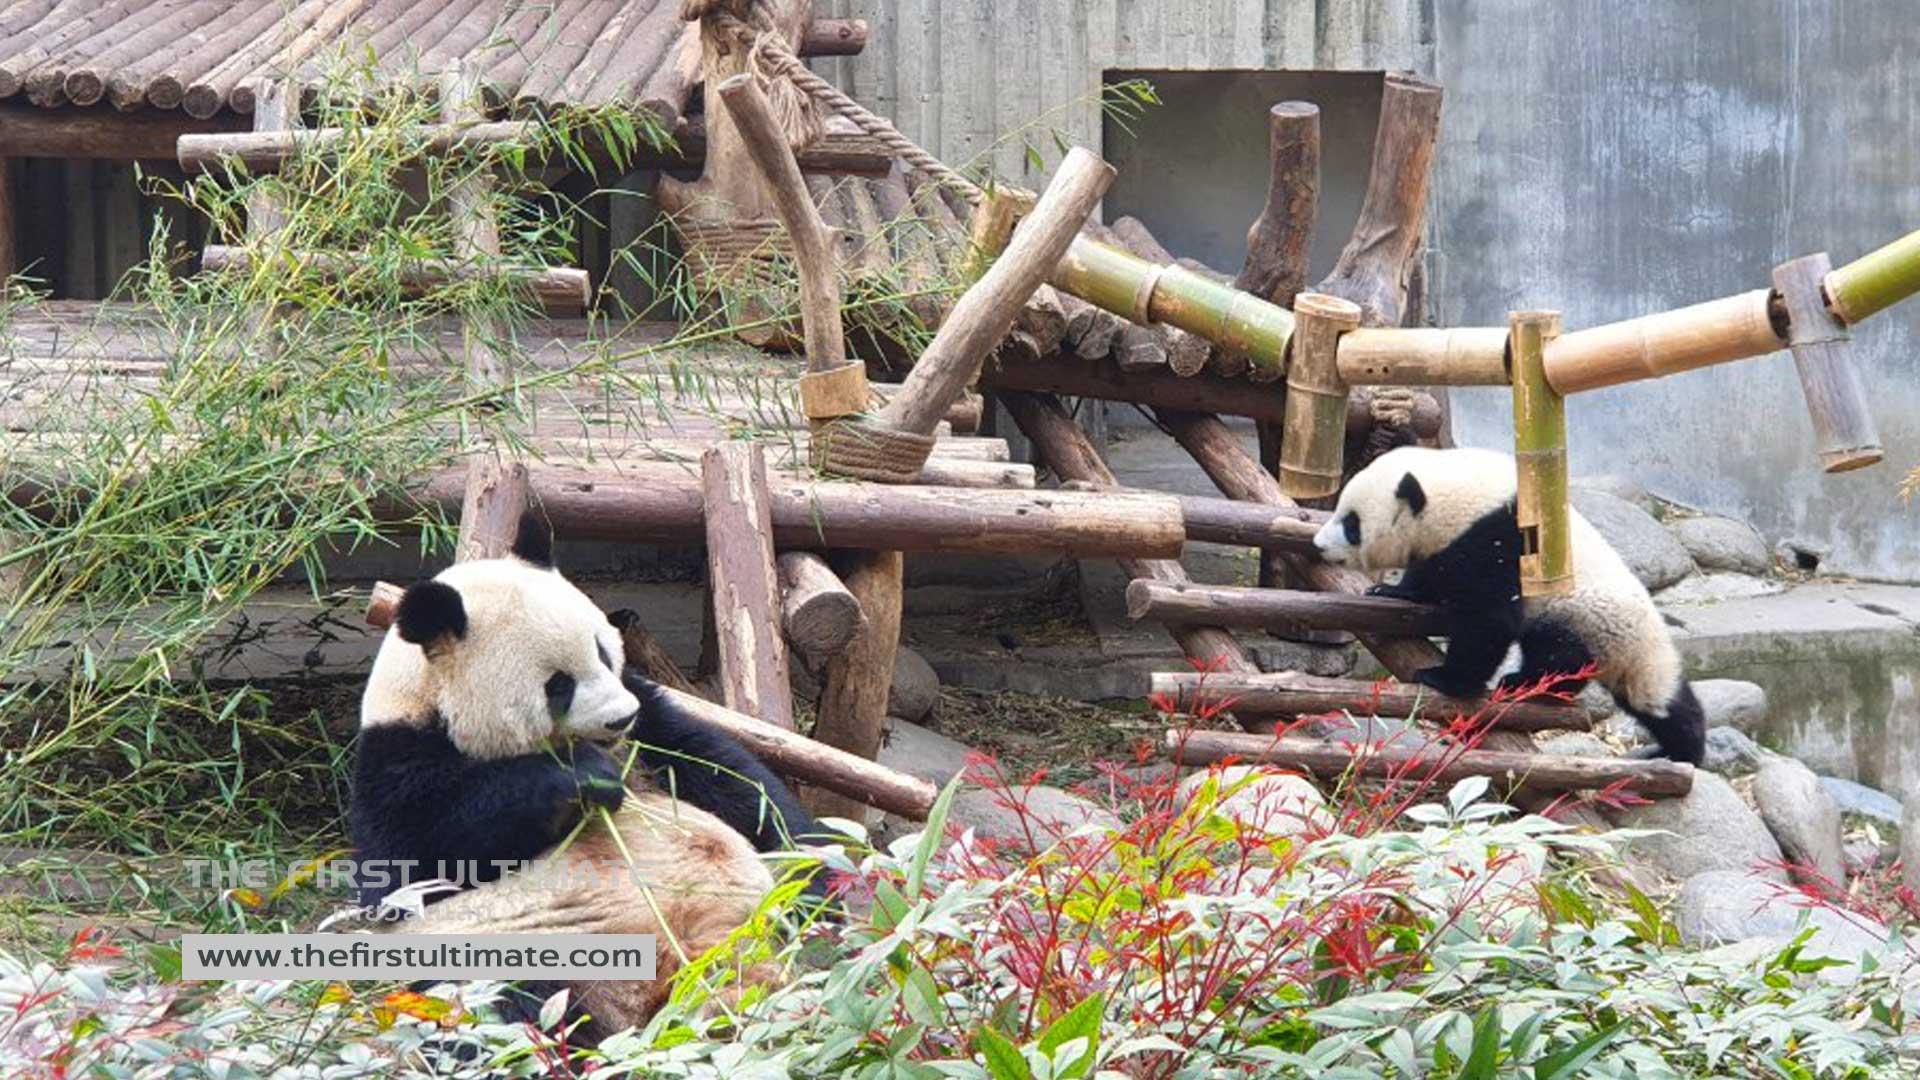 Giant Pandas and Chengdu เที่ยวเฉิงตู ไปดูแพนด้ากัน